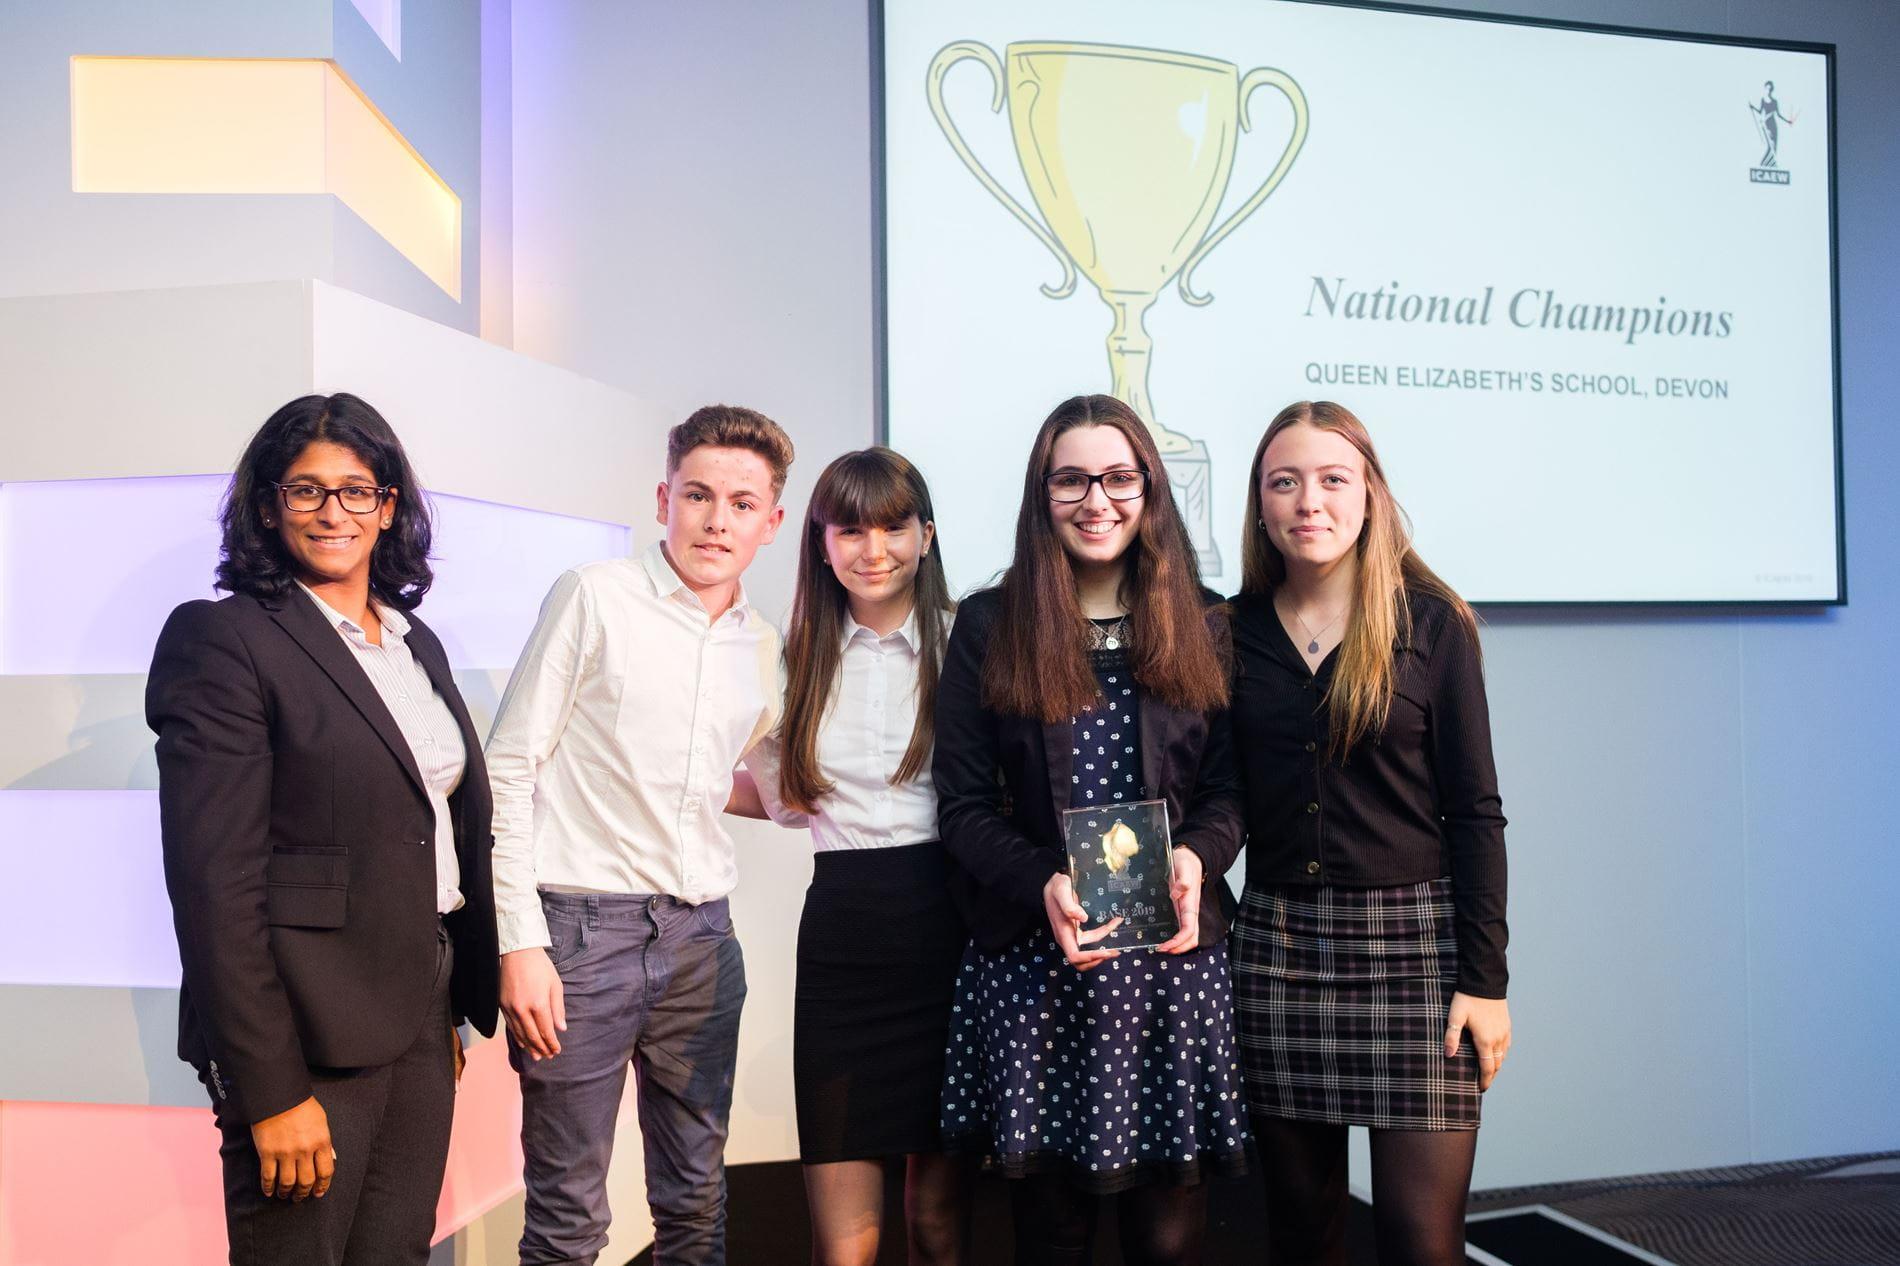 BASE 2019 National Champions - Queen Elizabeth's School, Devon